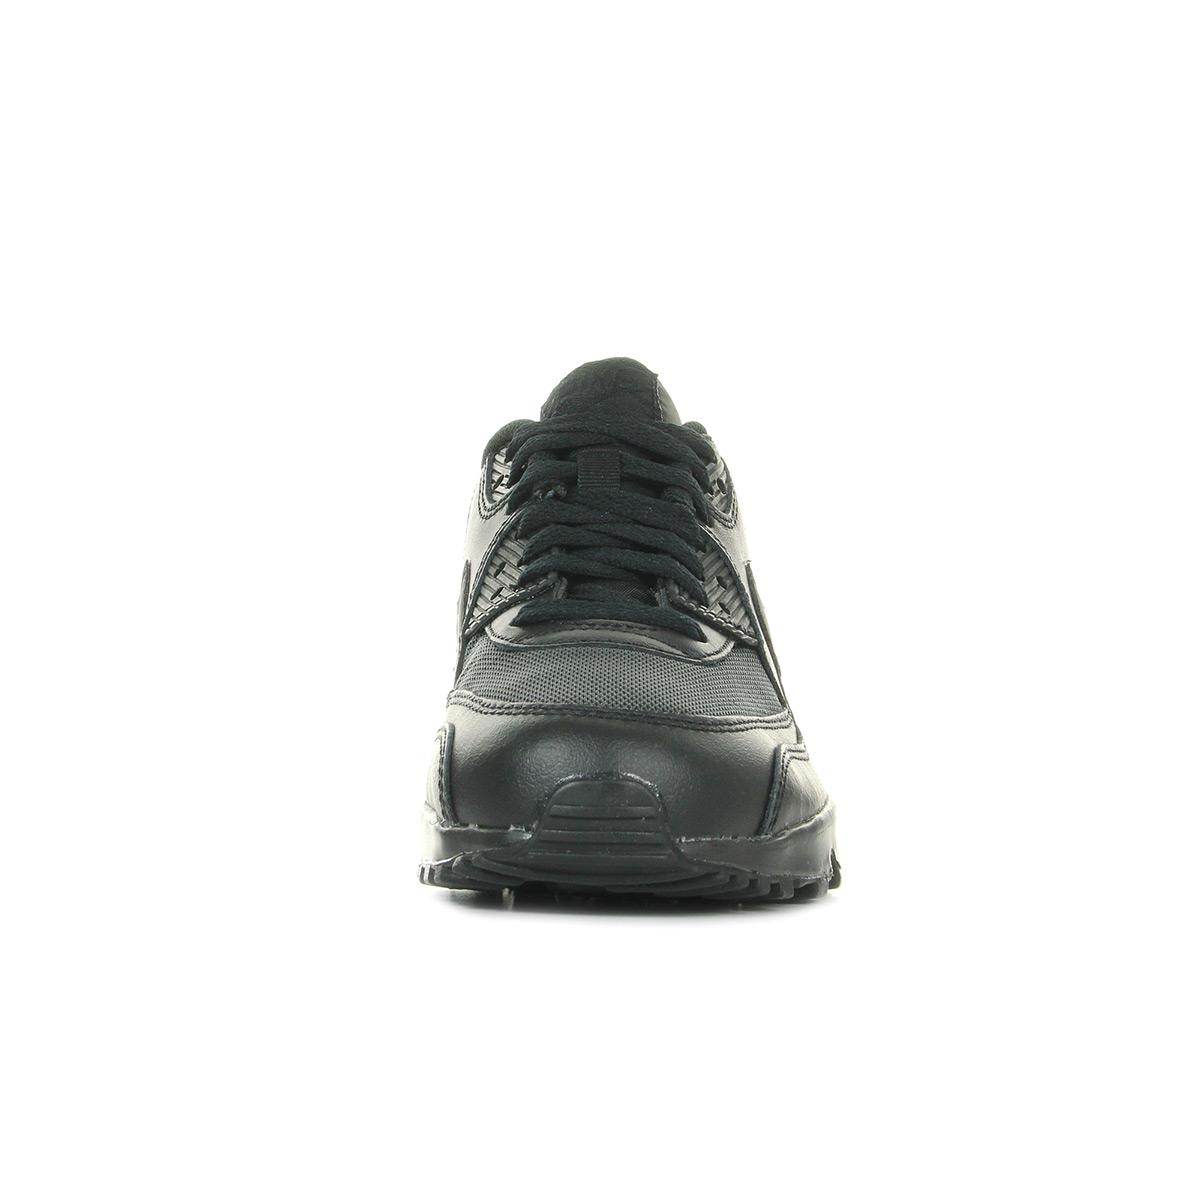 best loved a7281 88799 ... Nike Air Max 90 Mesh (GS) 833418001, Baskets mode ...